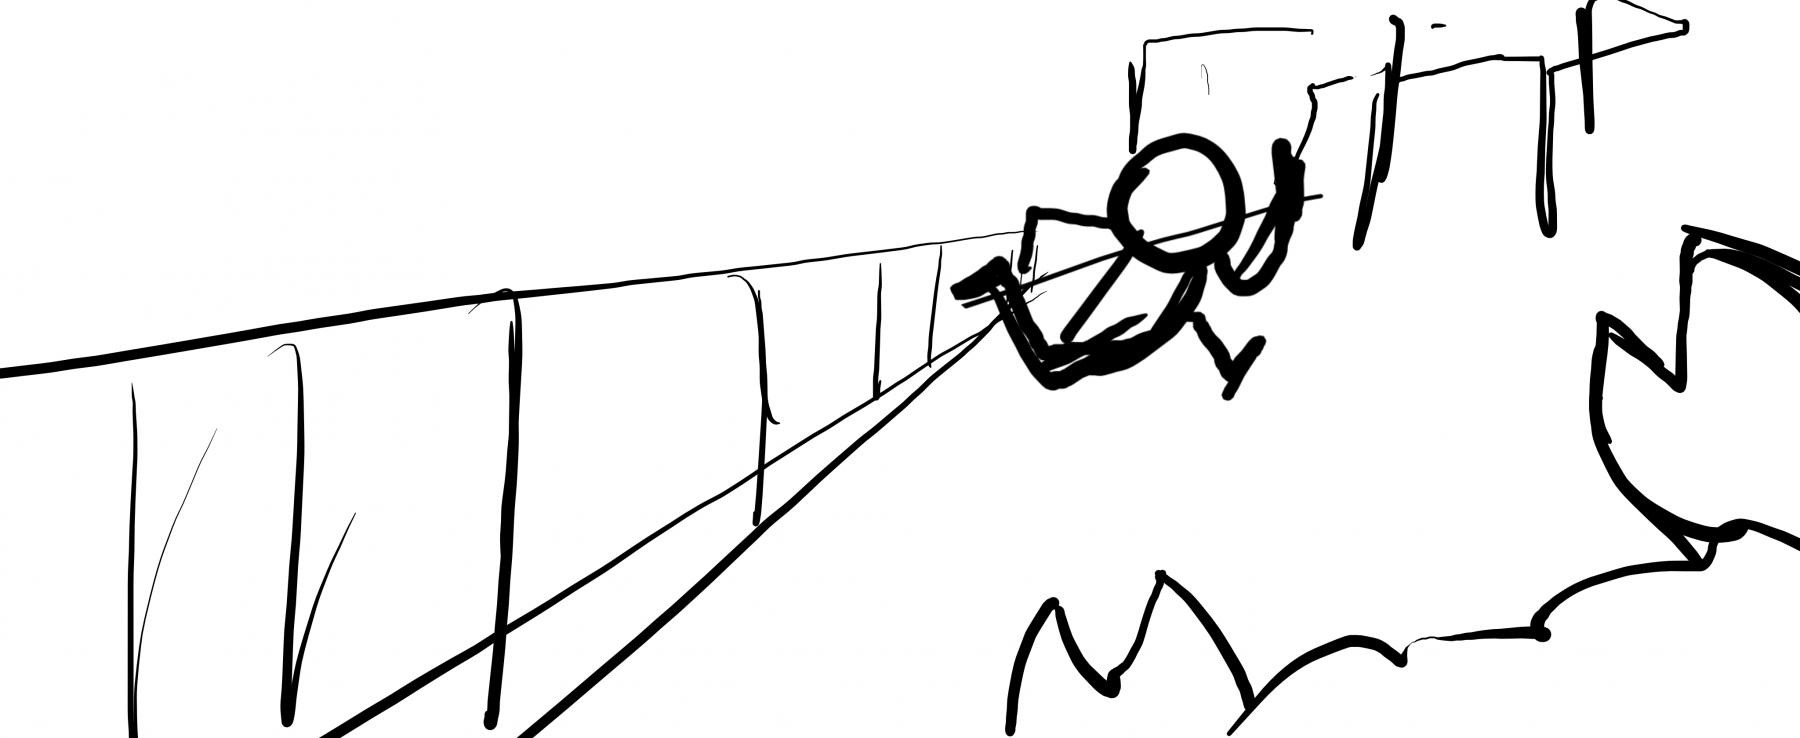 Nut-Thumbnail-Rough-Board00299